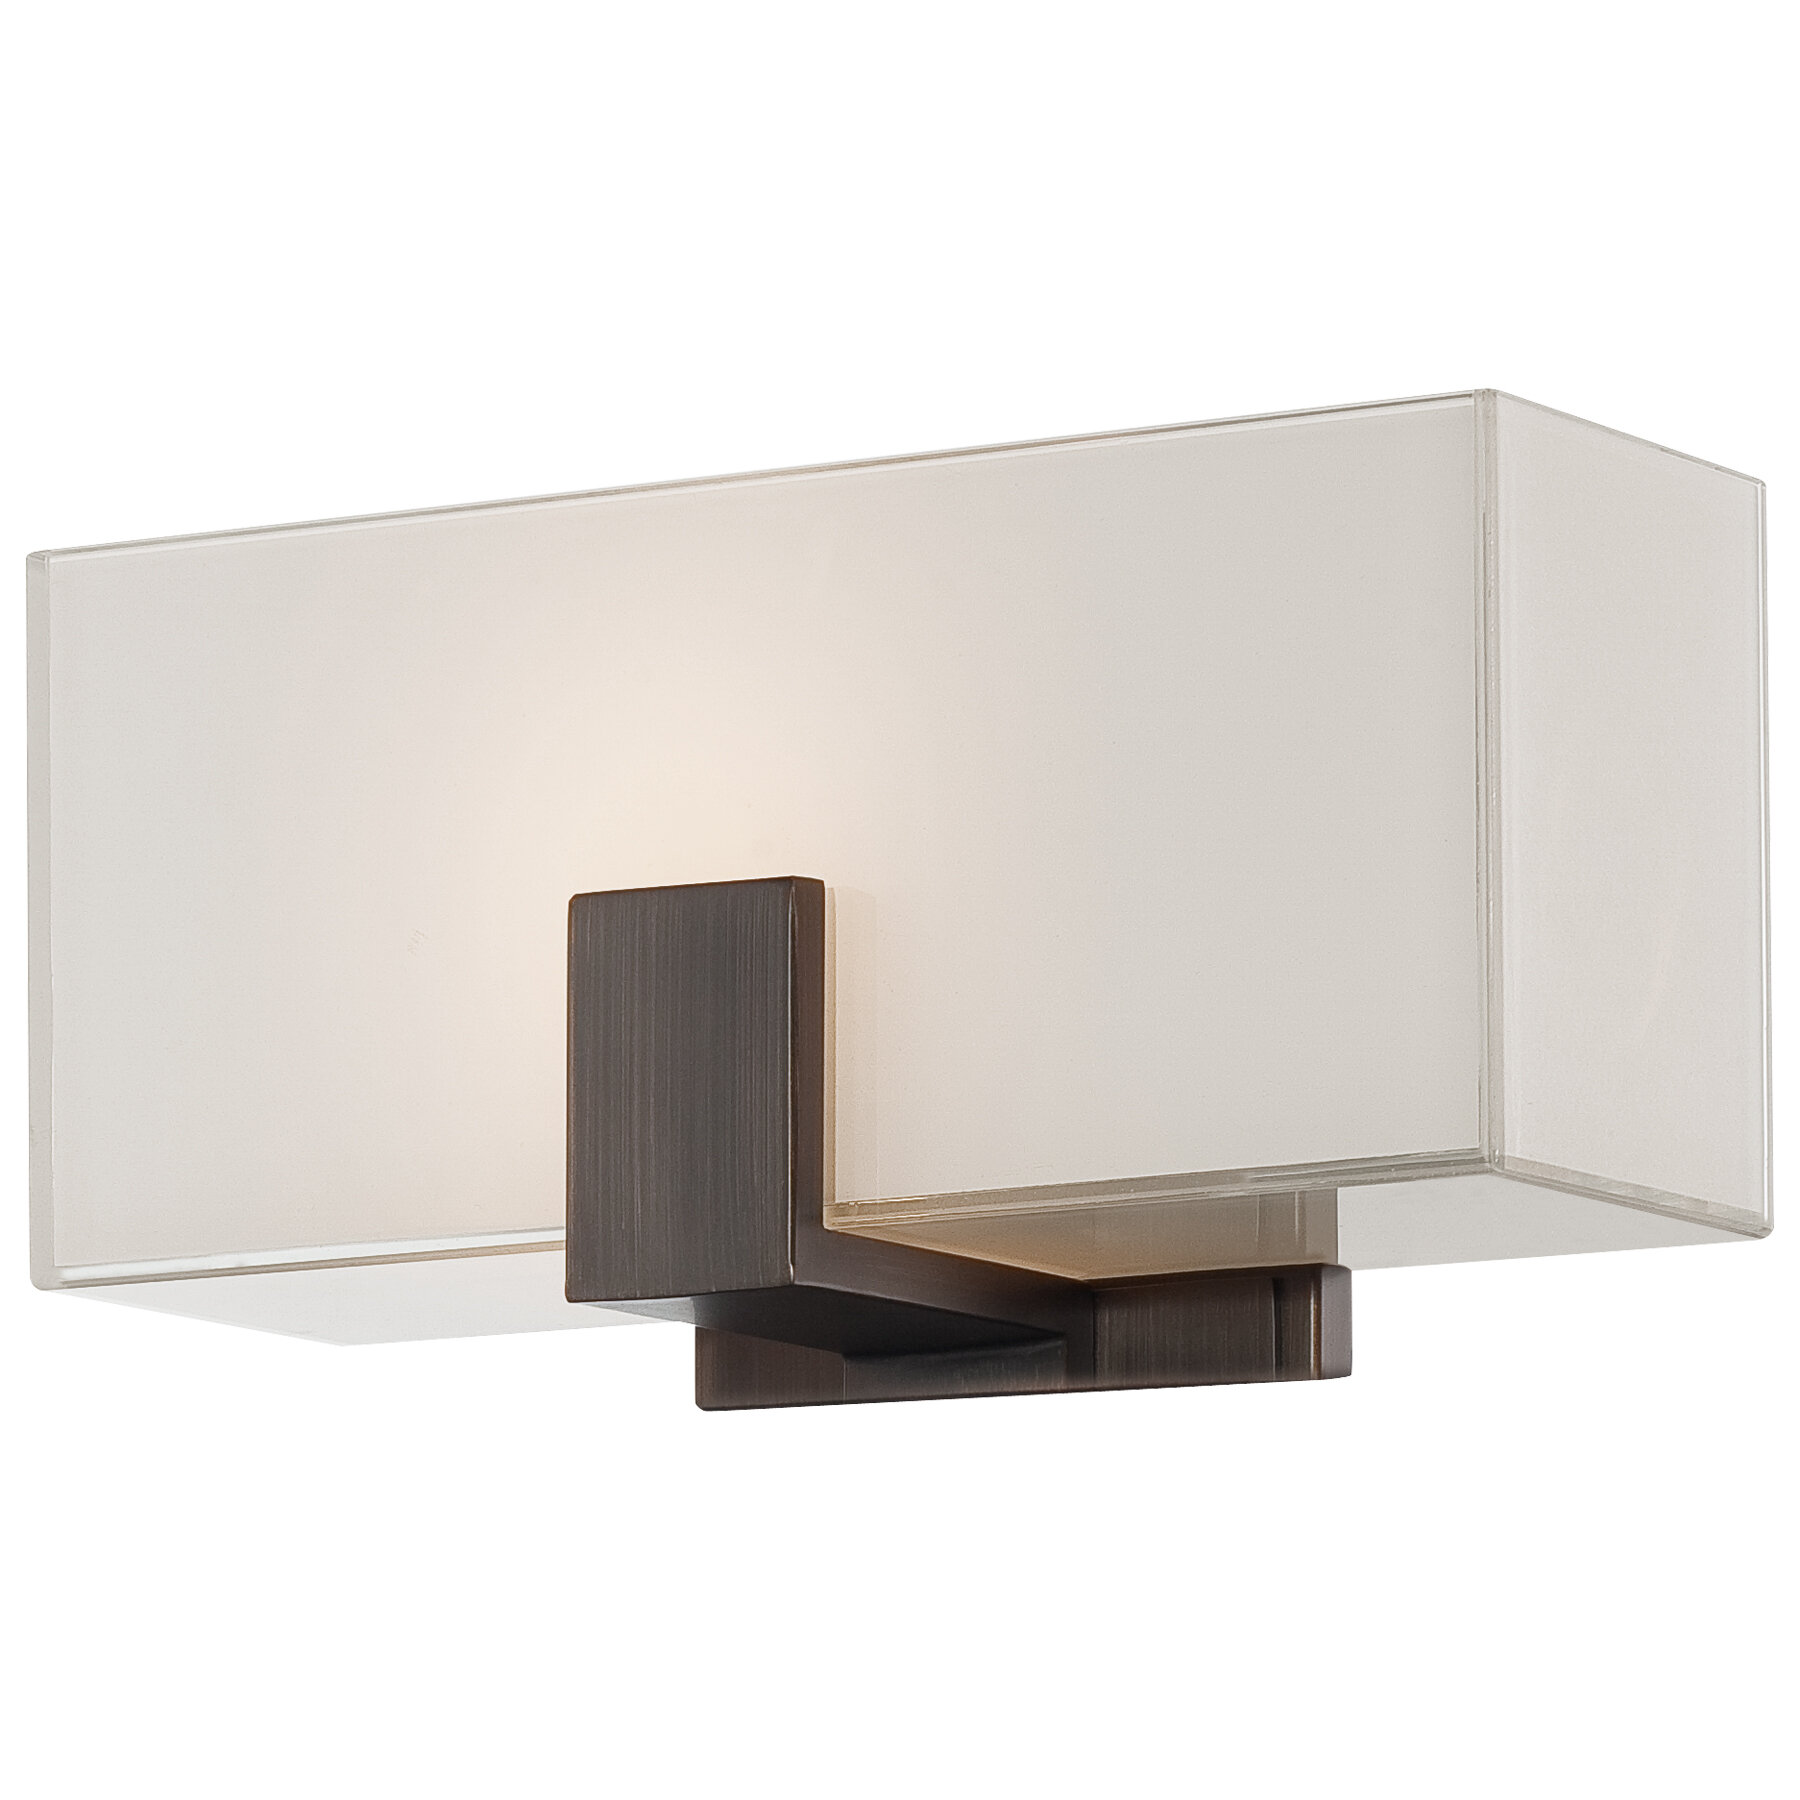 Latitude Run Salar 1-Light Wall Sconce with Square Shades u0026 Reviews   Wayfair  sc 1 st  Wayfair & Latitude Run Salar 1-Light Wall Sconce with Square Shades ...